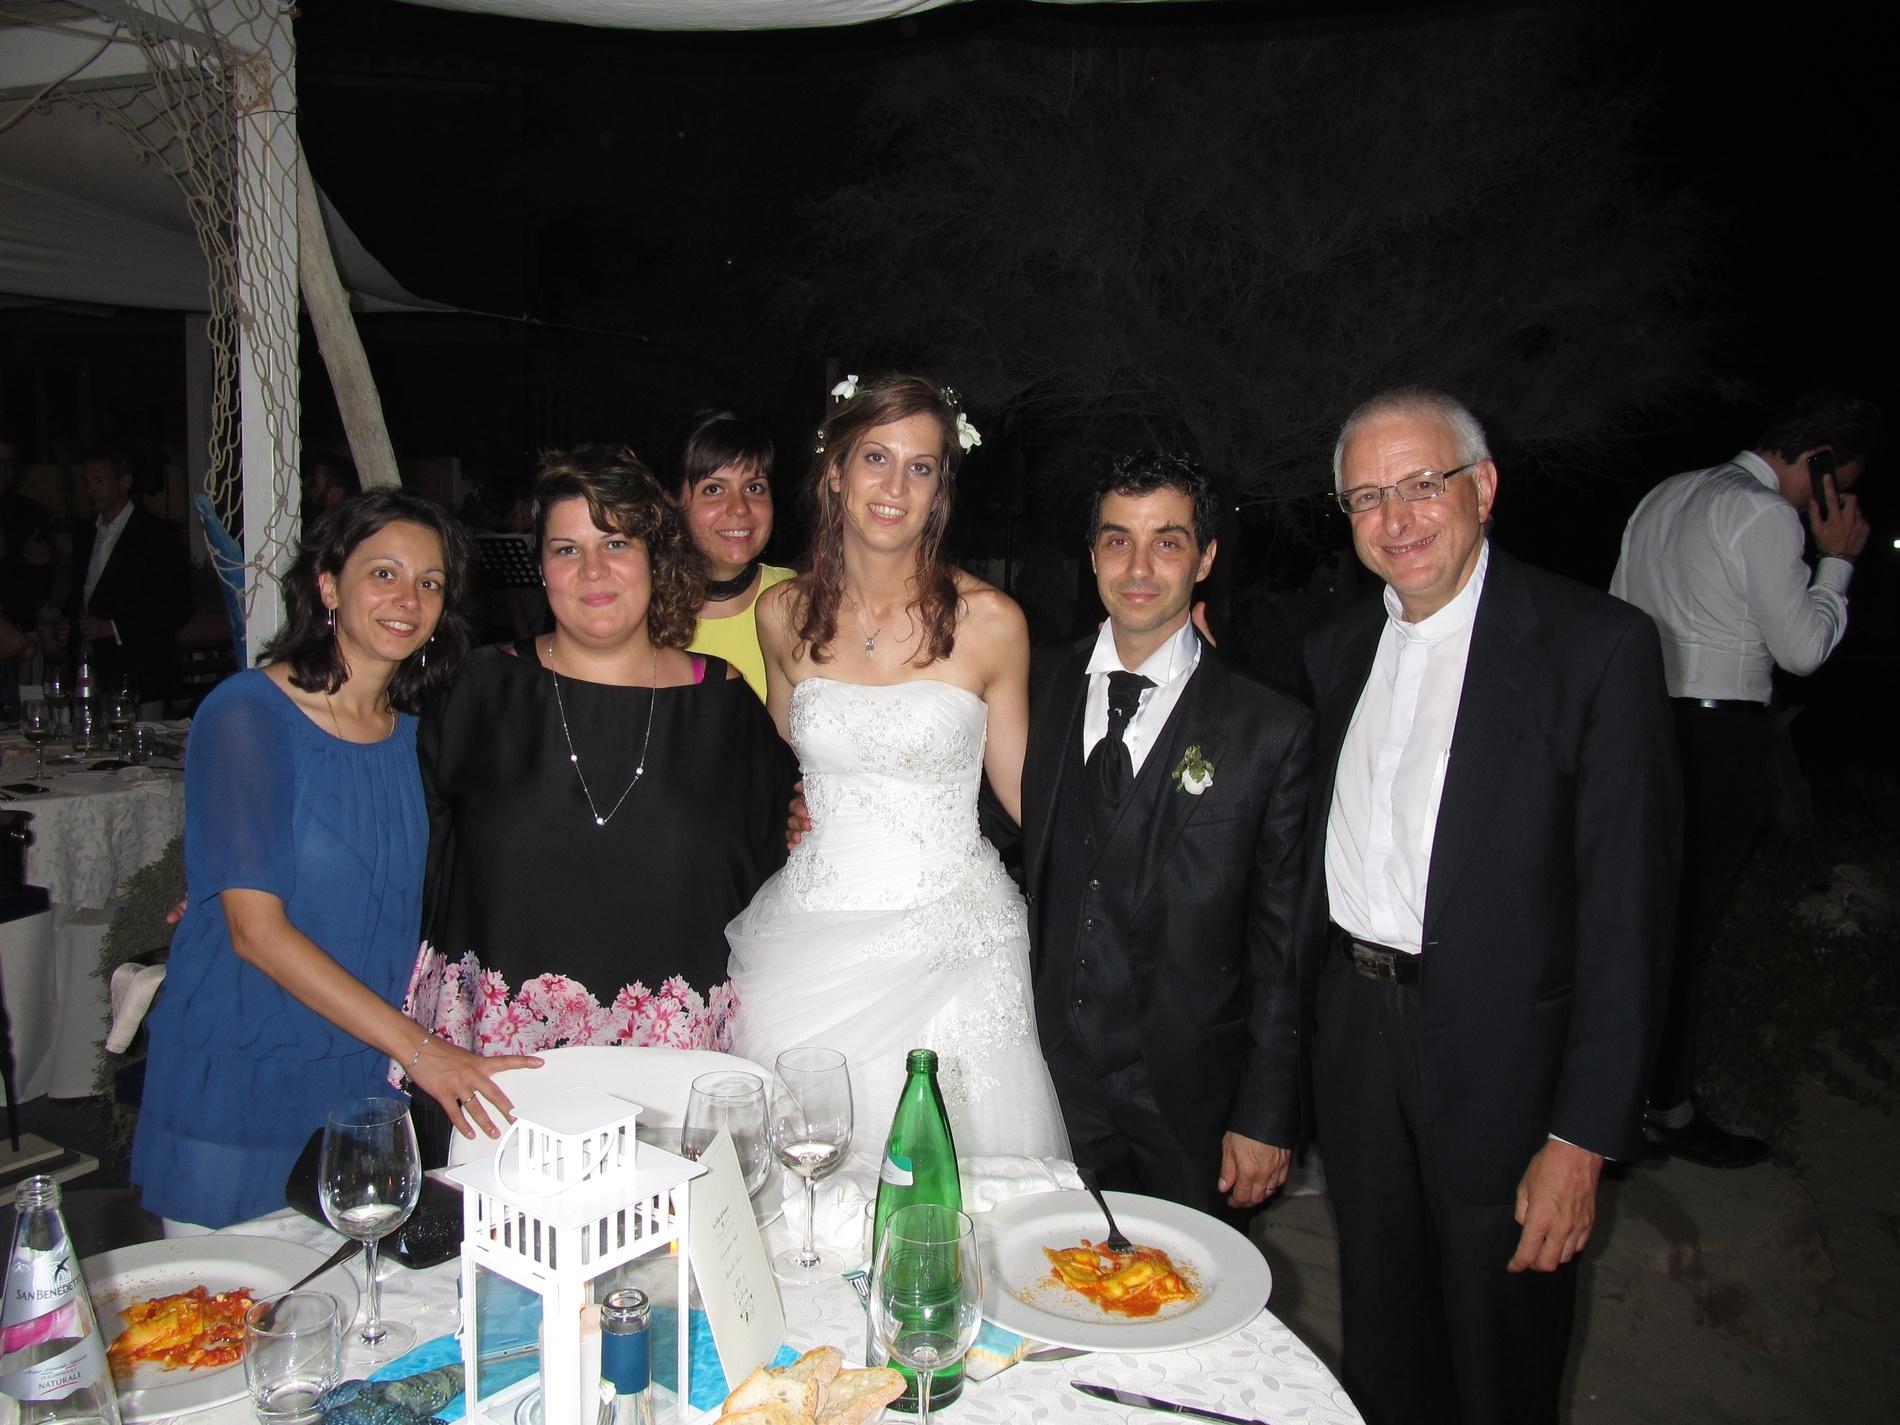 matrimonio-ilaria-torrisi-e-marco-di-lucia-2015-08-08-21-15-51